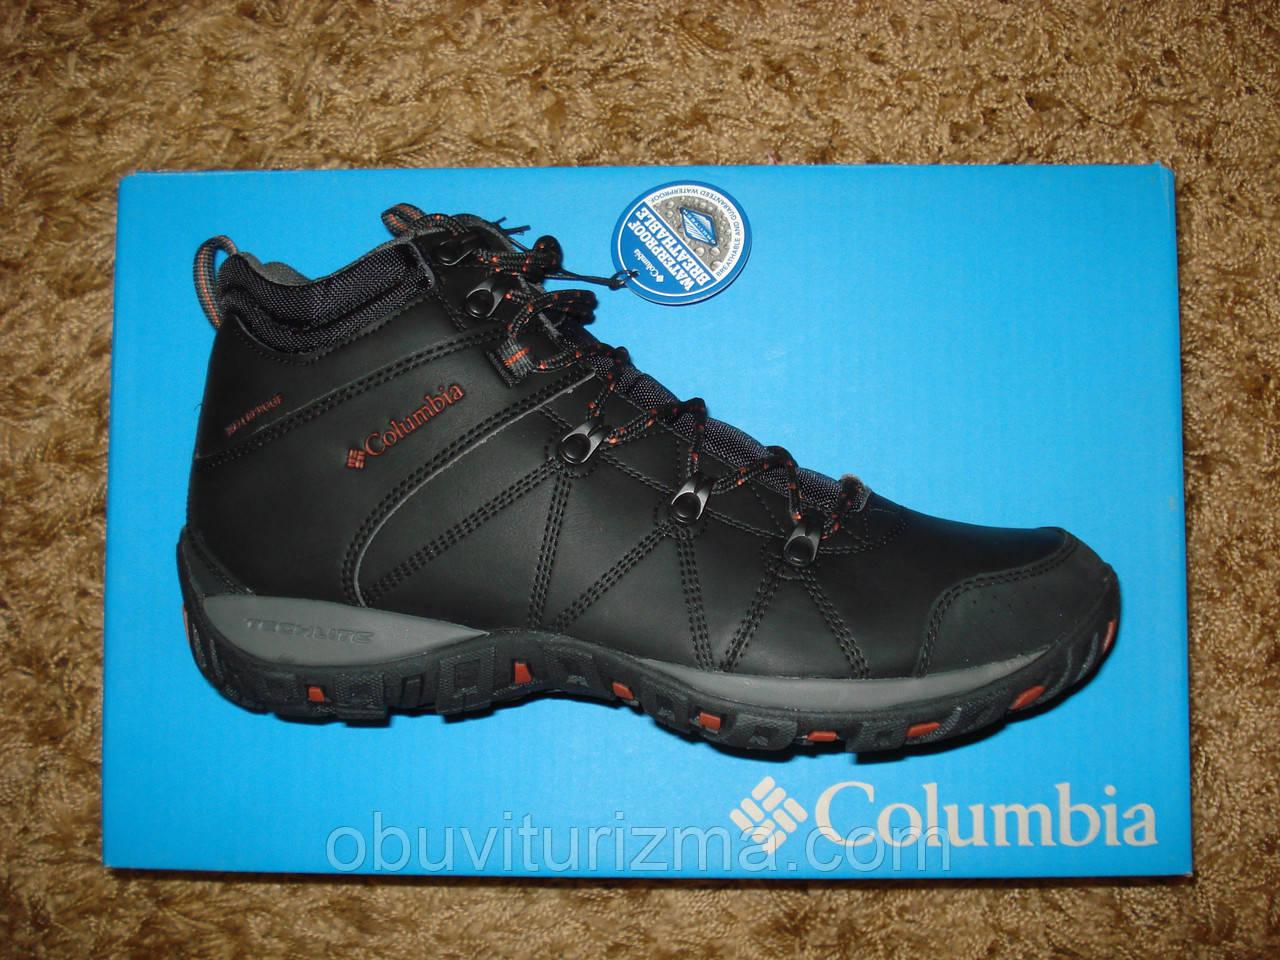 -24% Скидка Осталось 14 дней. next previous. Ботинки Columbia Peakfreak™  Venture Mid Waterproof BM3991 ... dded0651e57